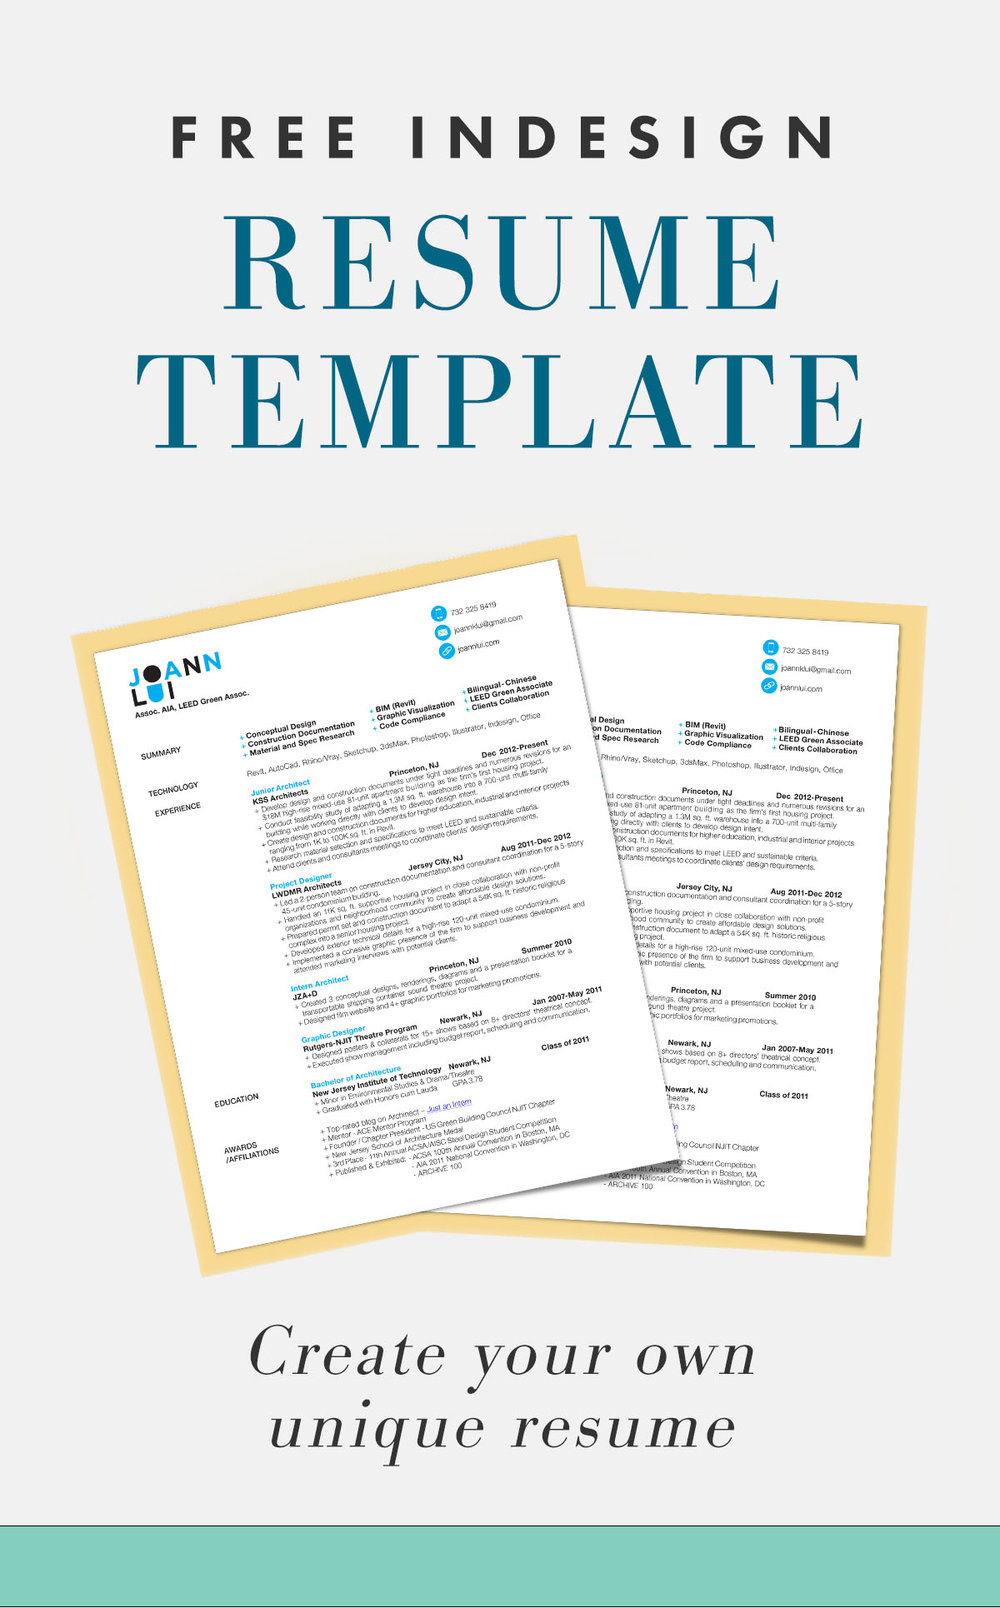 Free-Resume-Template.jpg